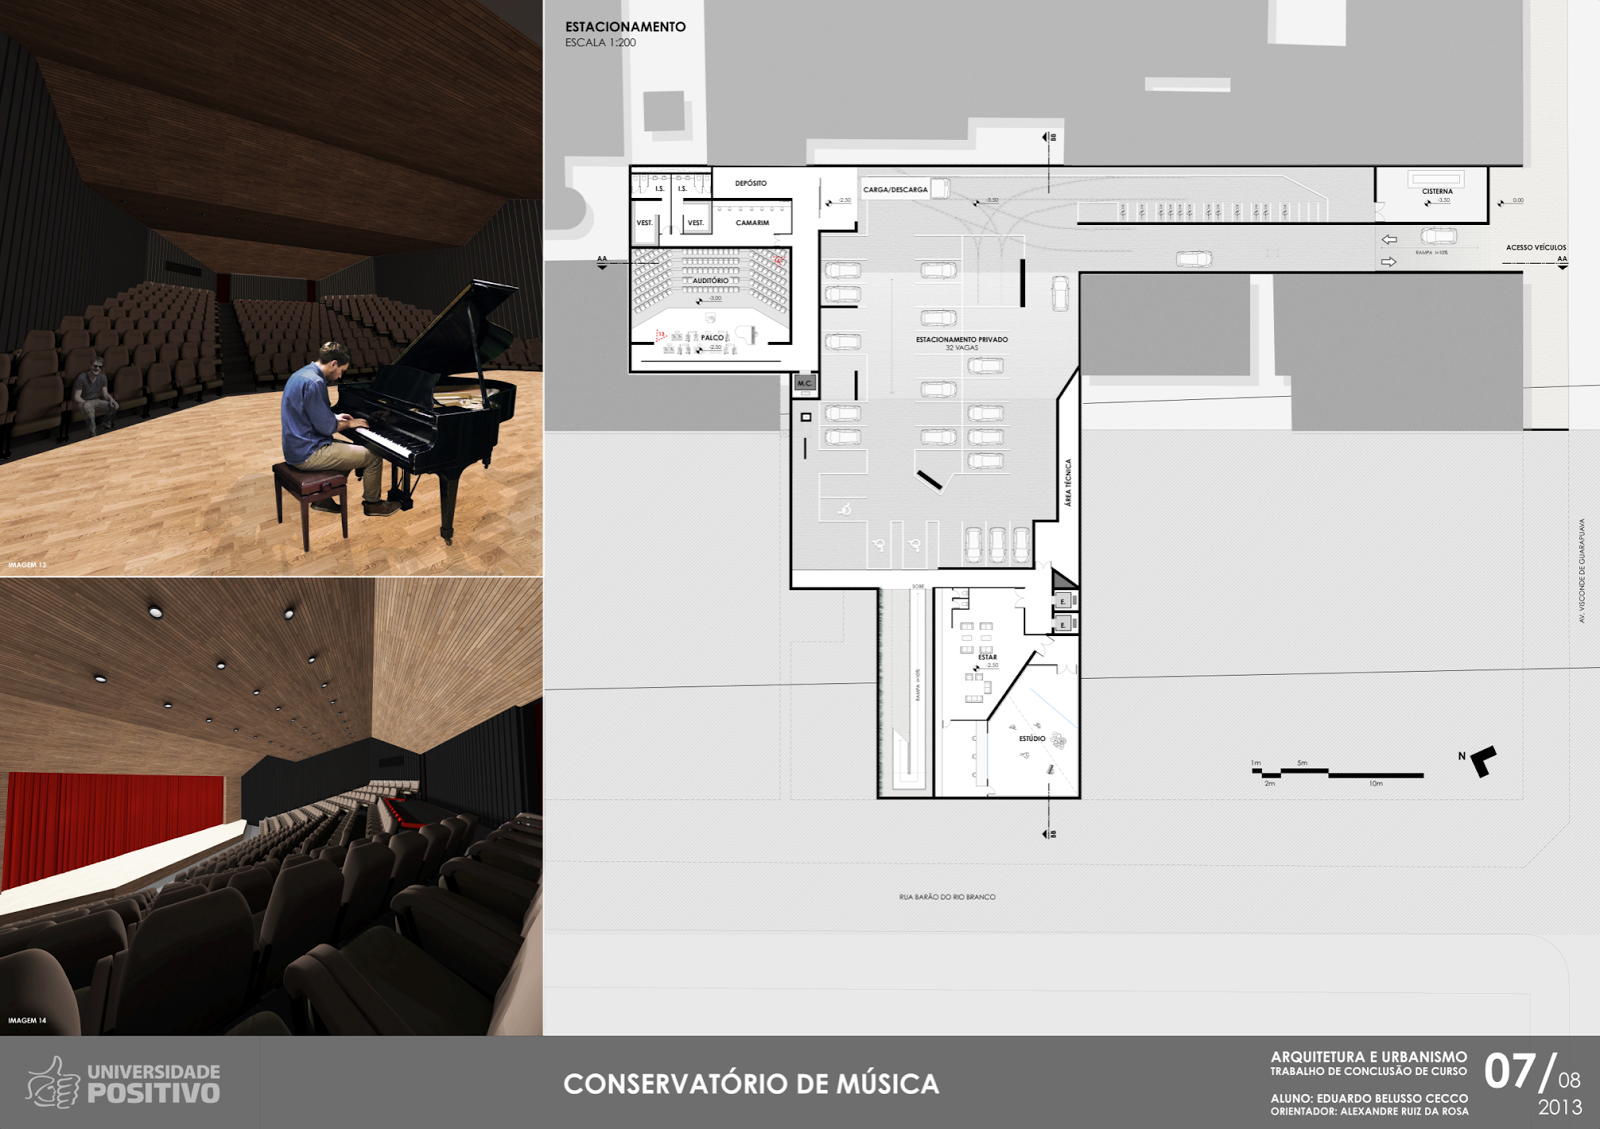 Portf lio de tcc conservat rio de m sica for Conservatorio de musica